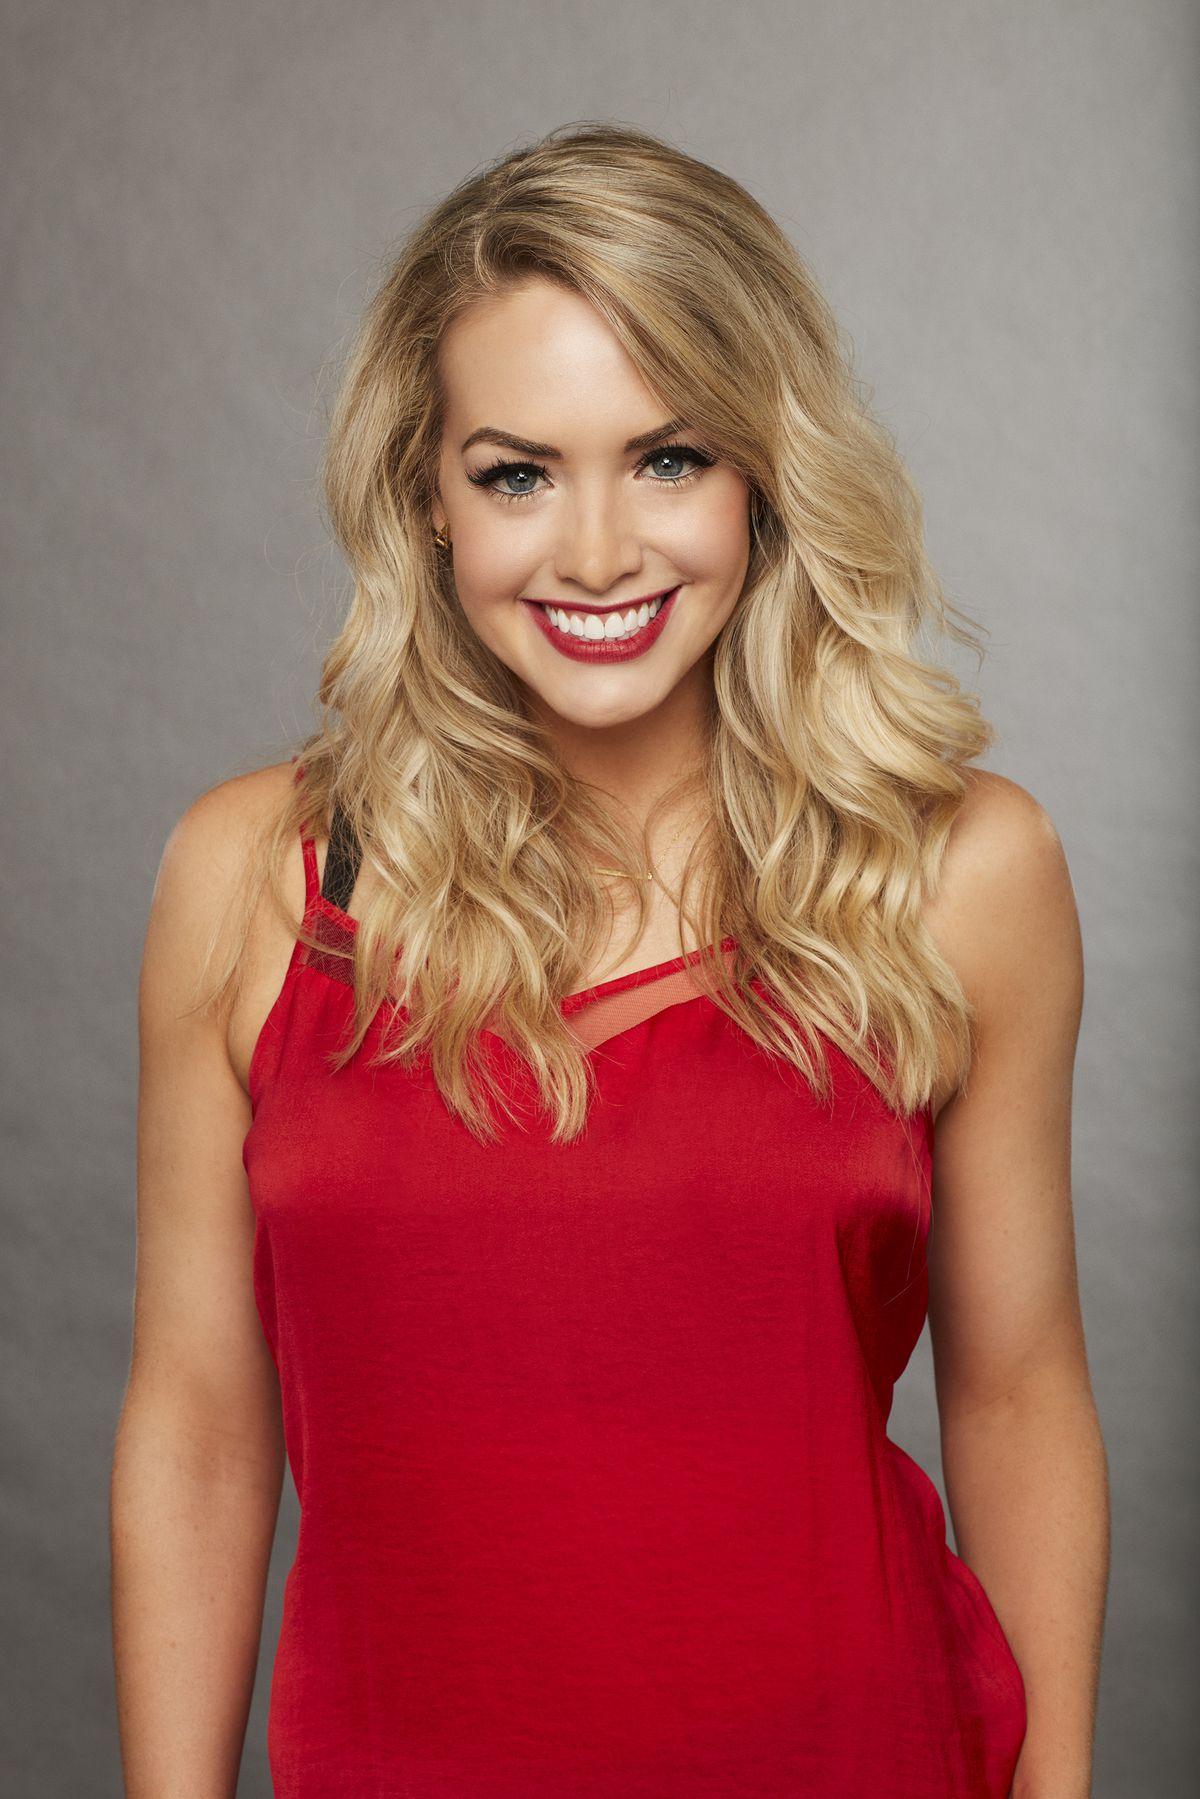 Bachelor contestant Jenna, 28